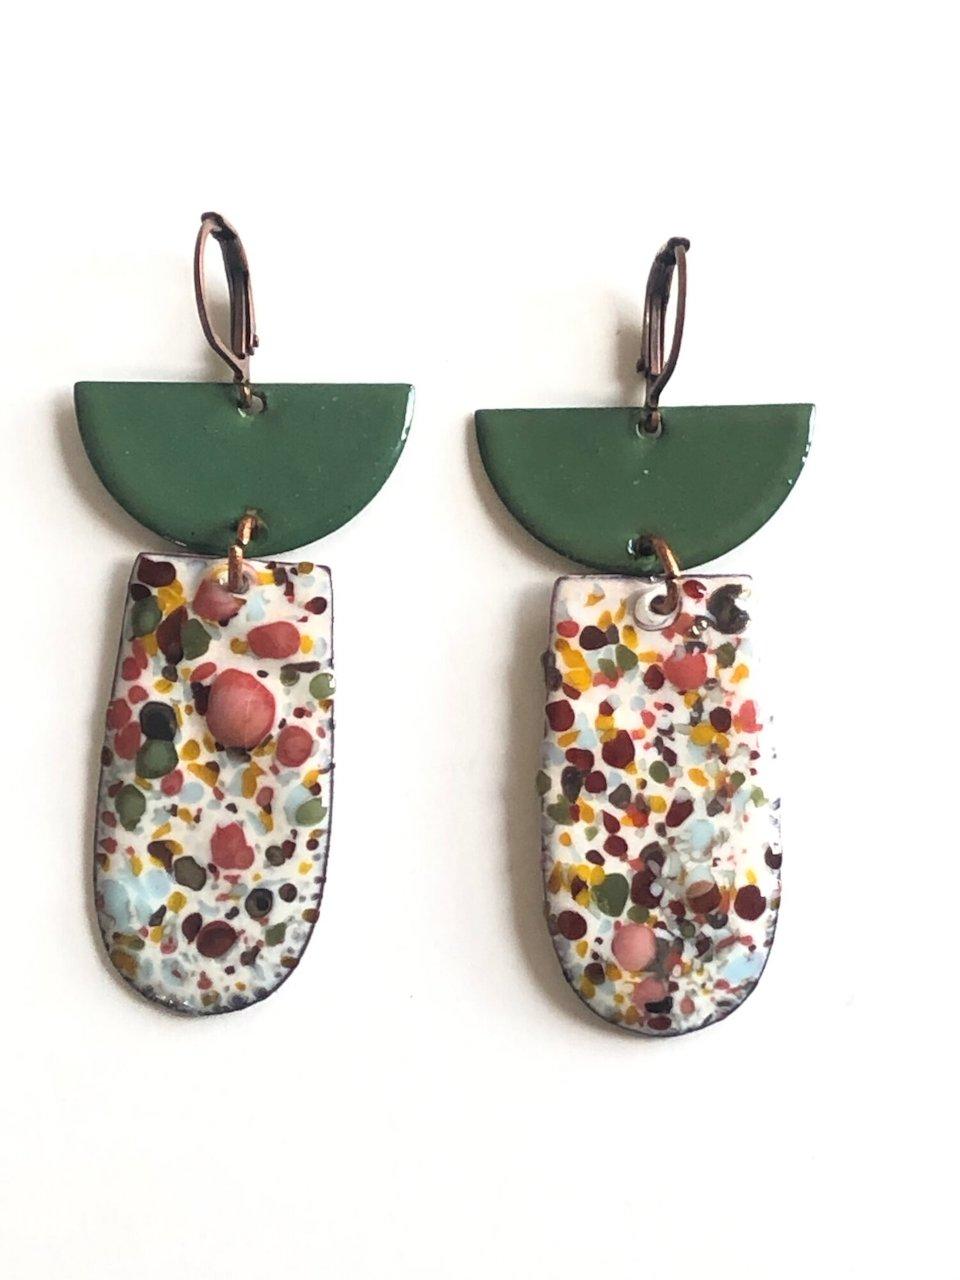 Polymer clay art beads Clay spike beads Handmade in Minnesota. Bead set